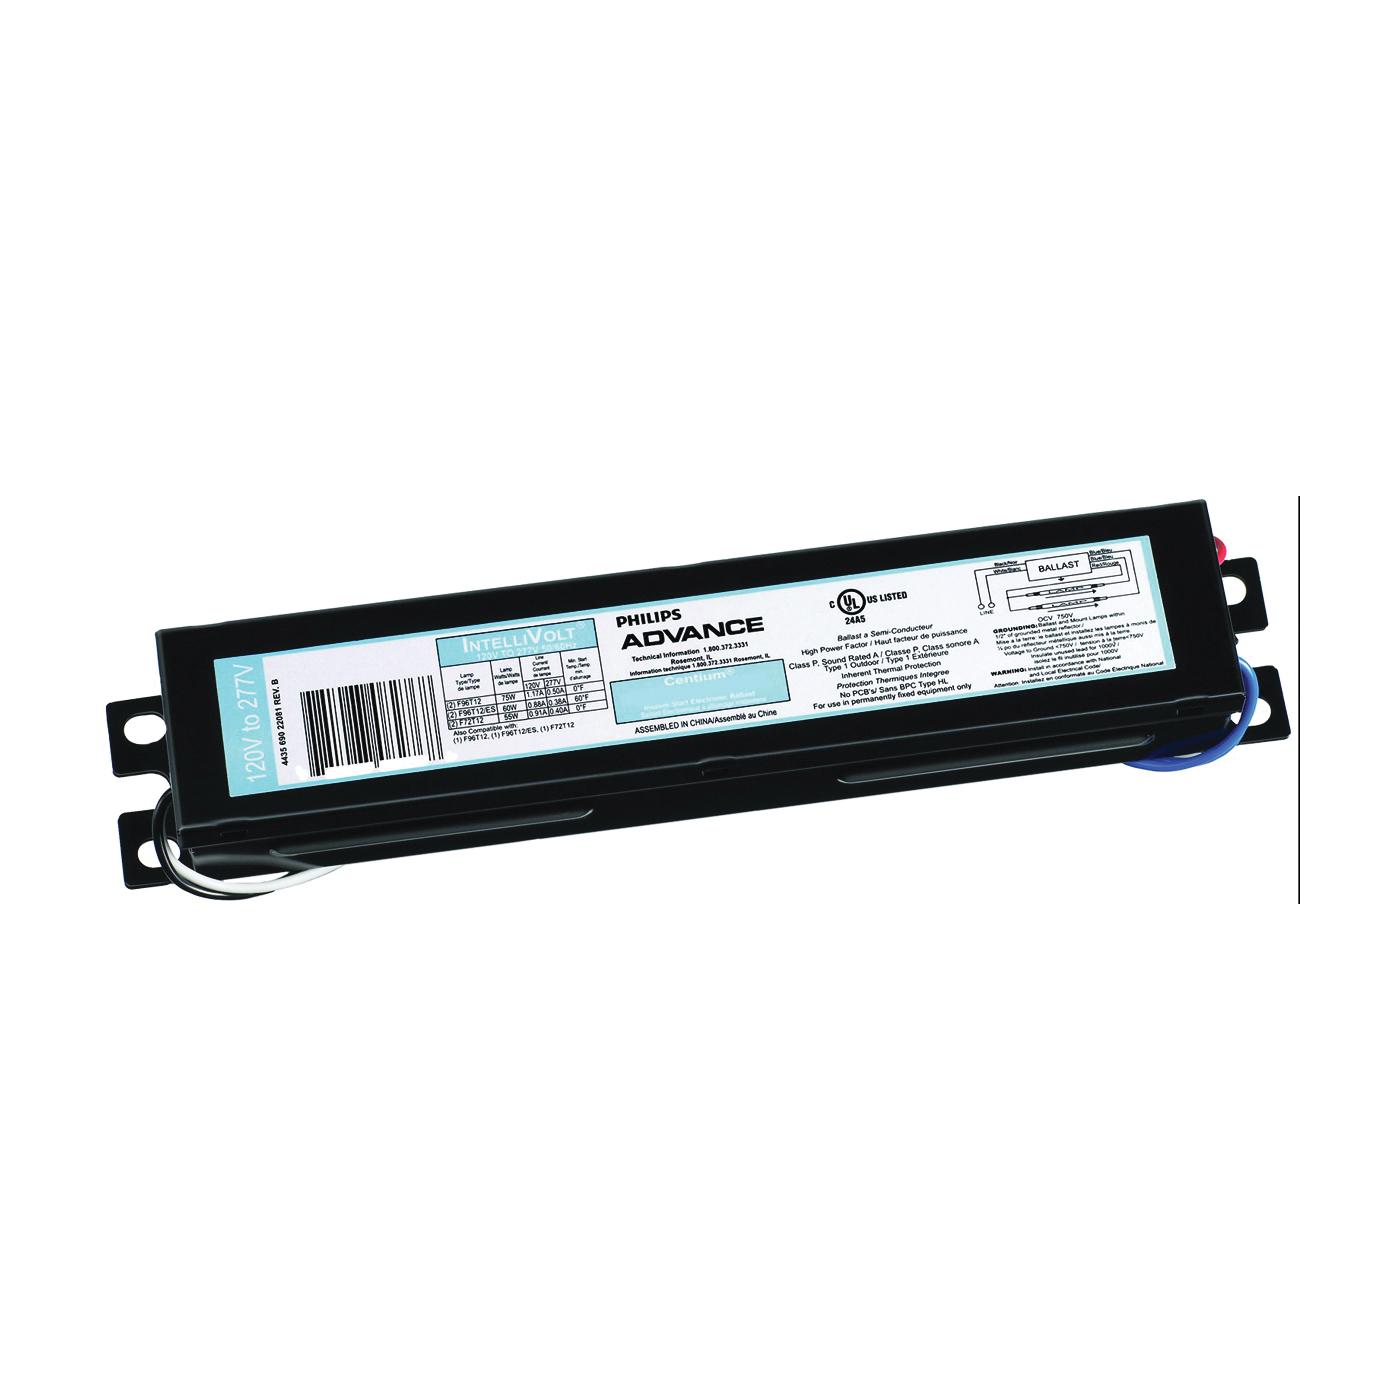 Philips Advance ICN2P60N35I